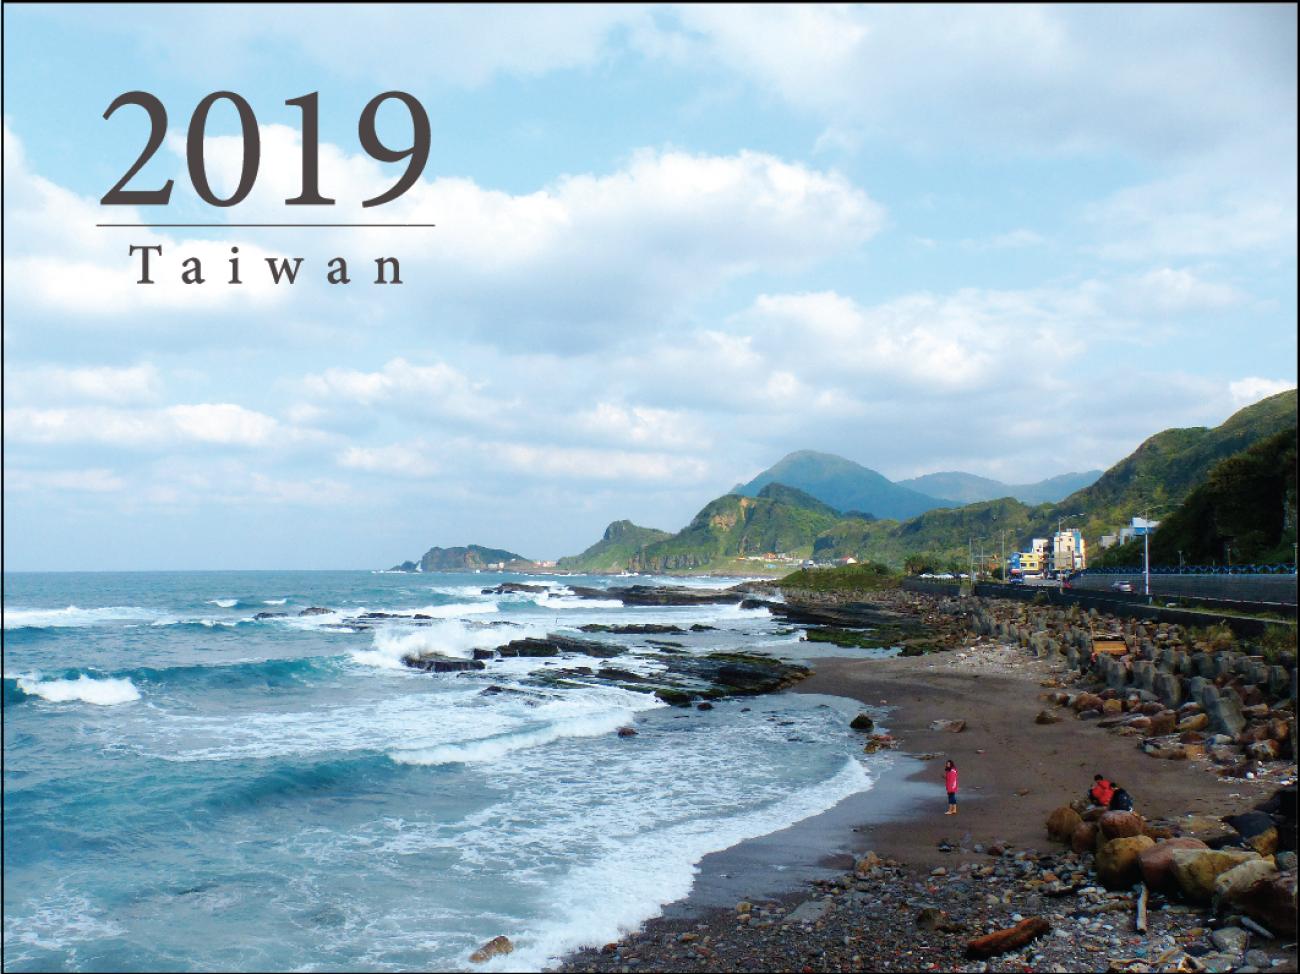 Kalender 2019 Cover